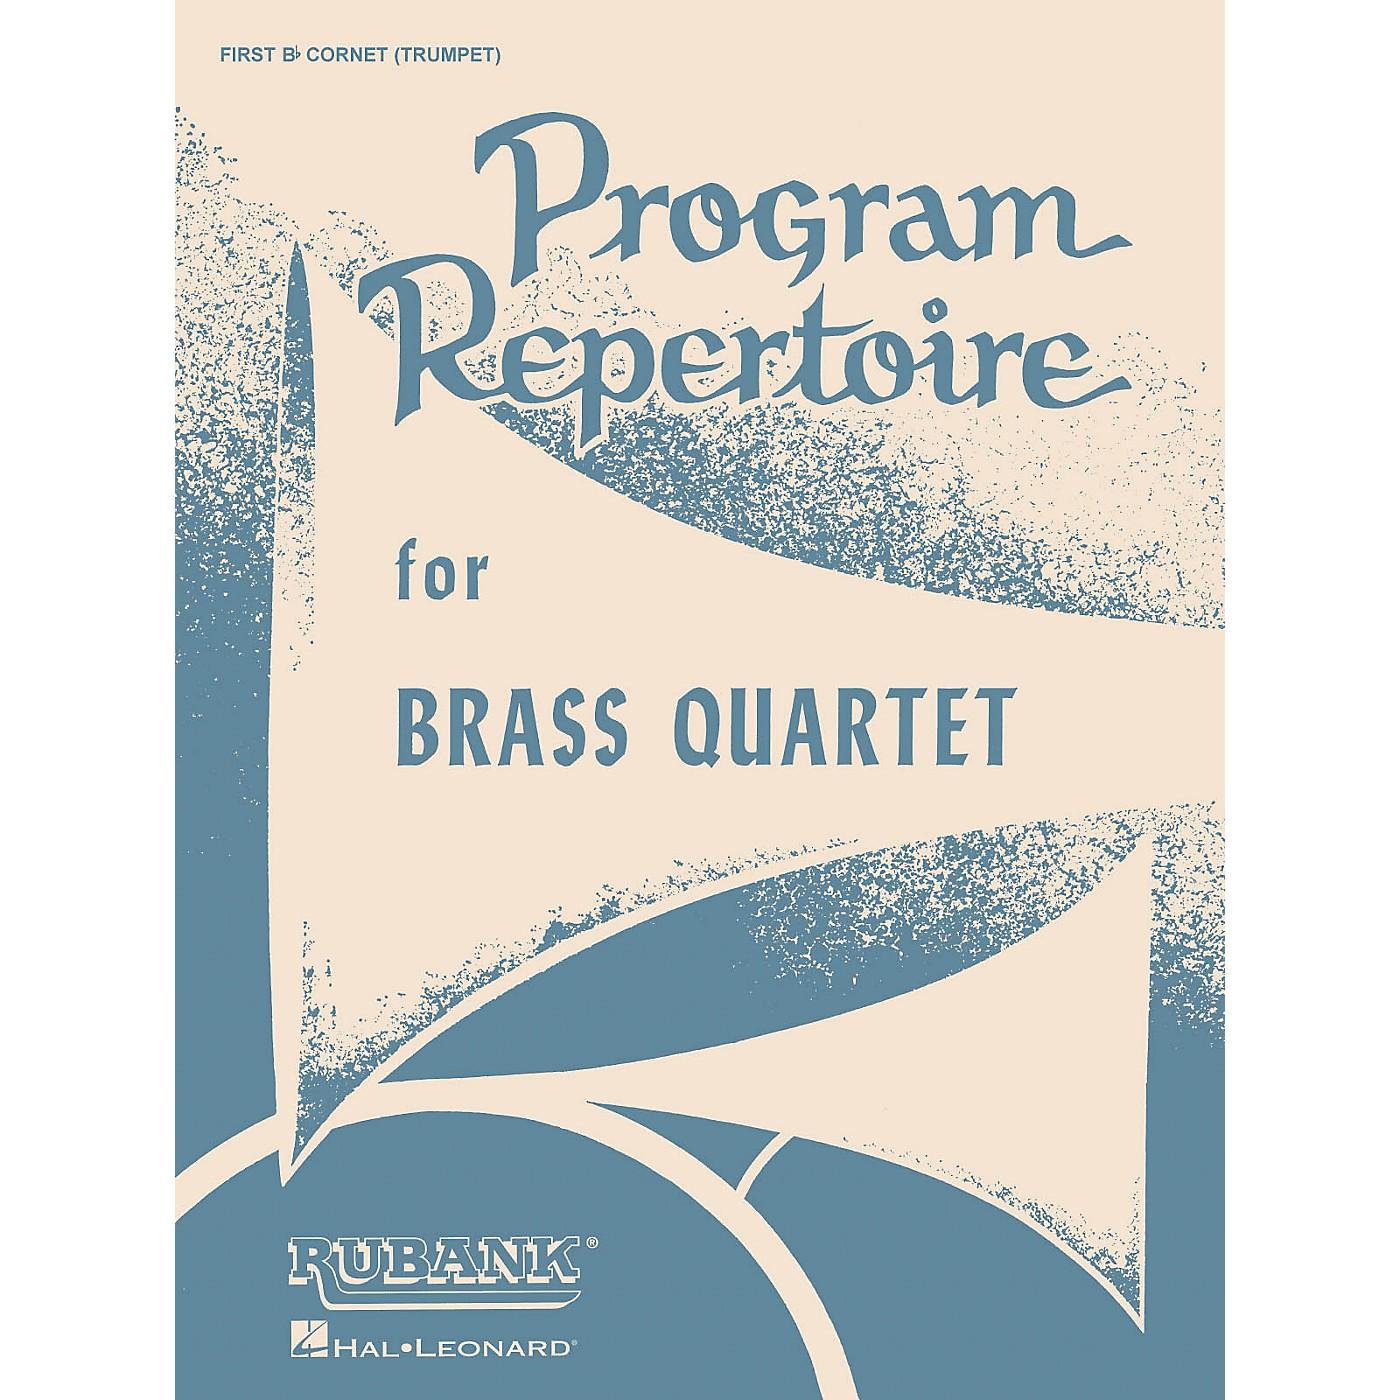 Rubank Publications Program Repertoire for Brass Quartet (Baritone T.C. (Fourth Part)) Ensemble Collection Series thumbnail